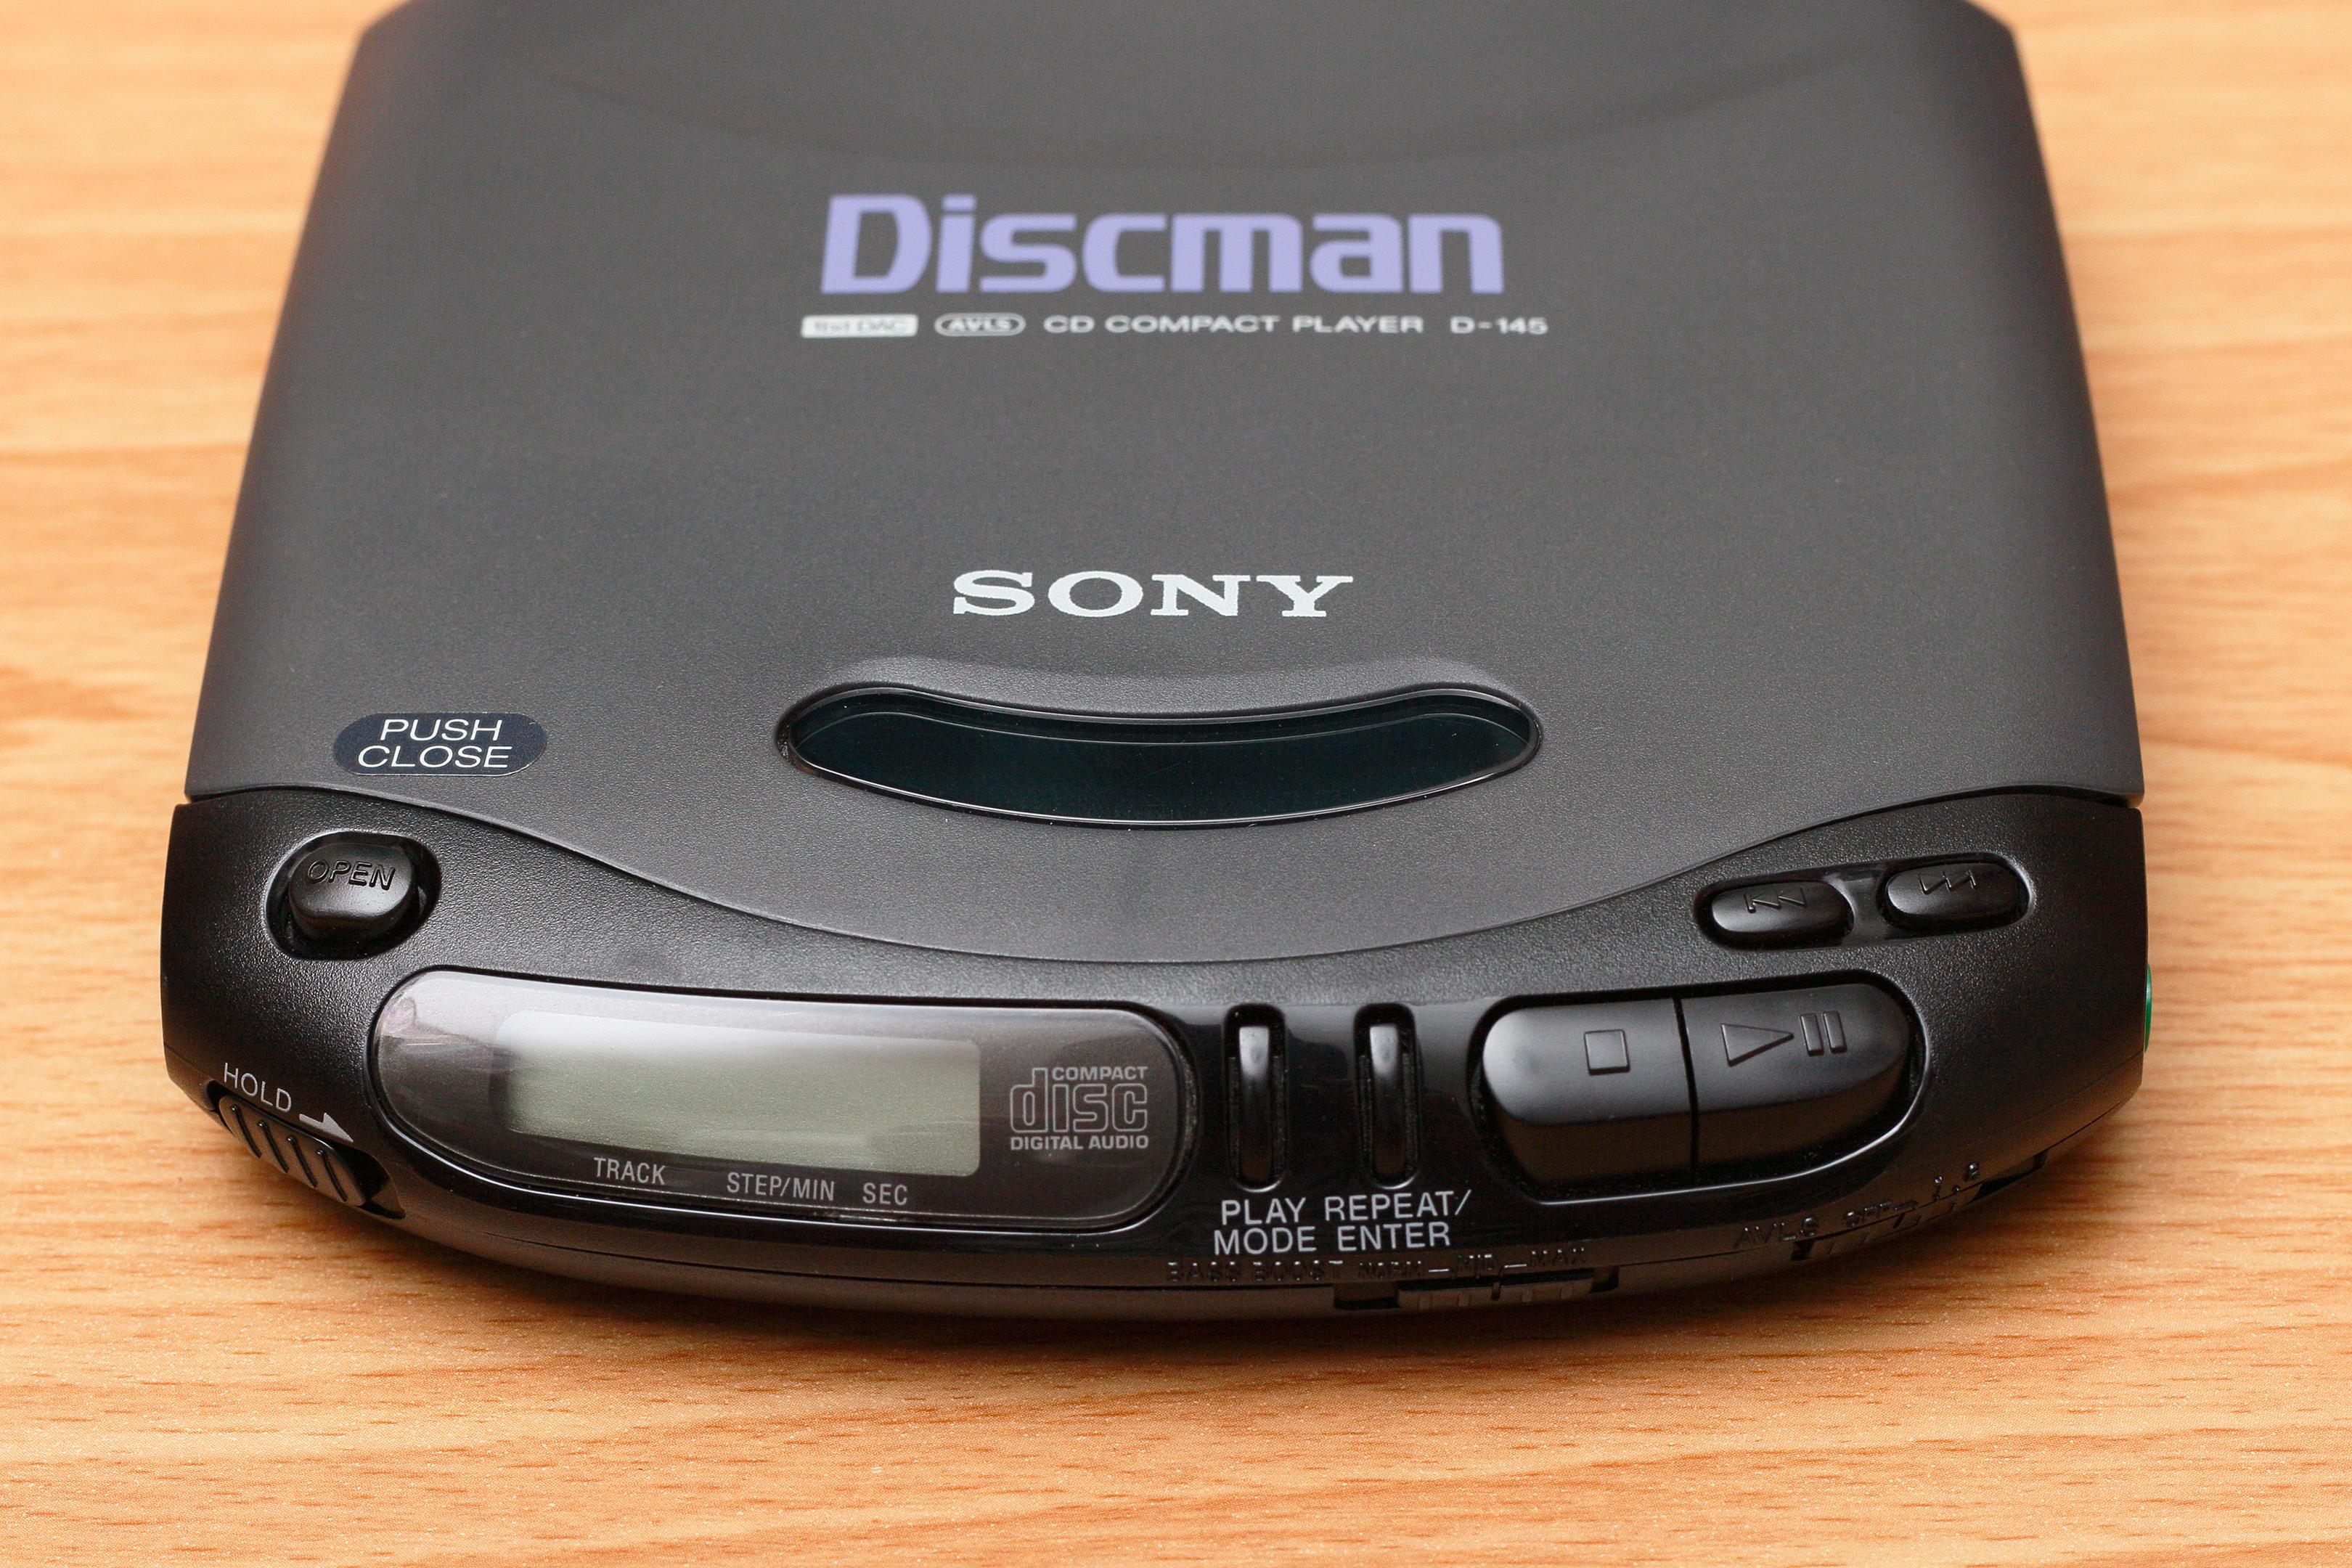 Personal Compact Discman CD Player Walkman Portable CD Player Small CD Player